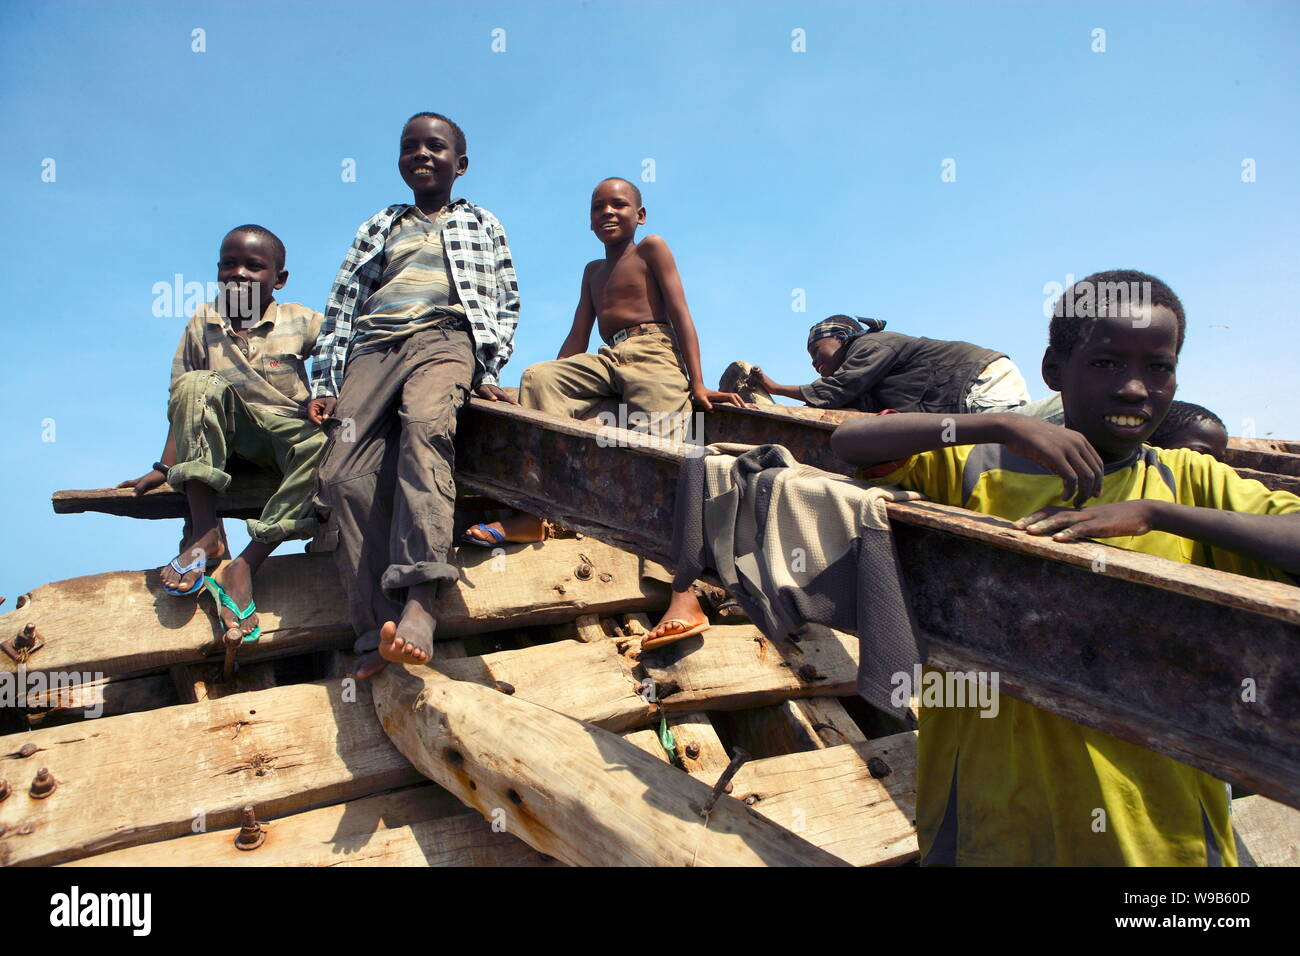 Somalian Pirate Stock Photos & Somalian Pirate Stock Images